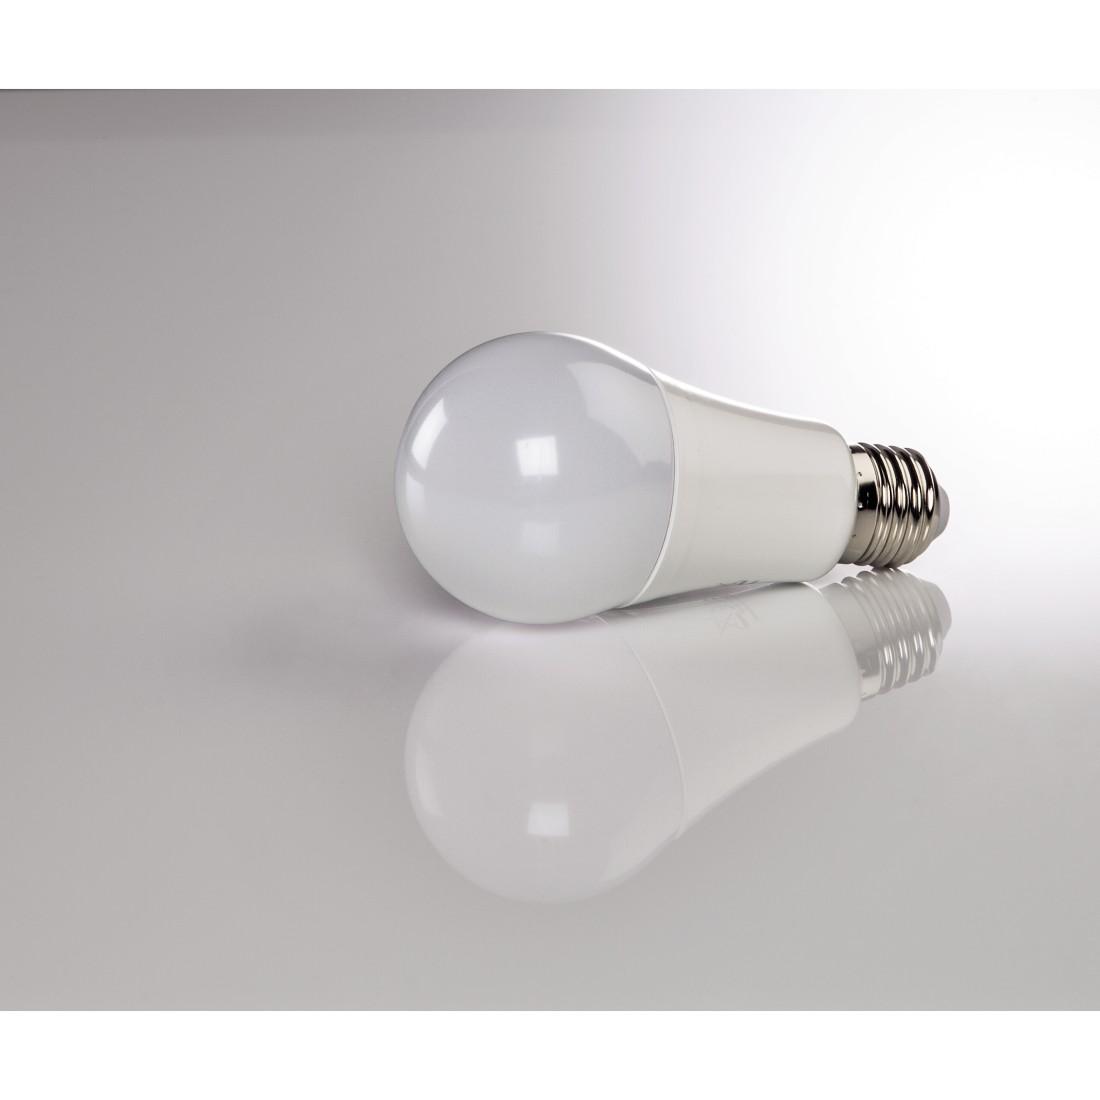 Xavax 00112187 xavax led lampe e27 806lm ersetzt 60w abx4 druckfhige abbildung 4 xavax led lampe e27 806lm ersetzt 60w parisarafo Images